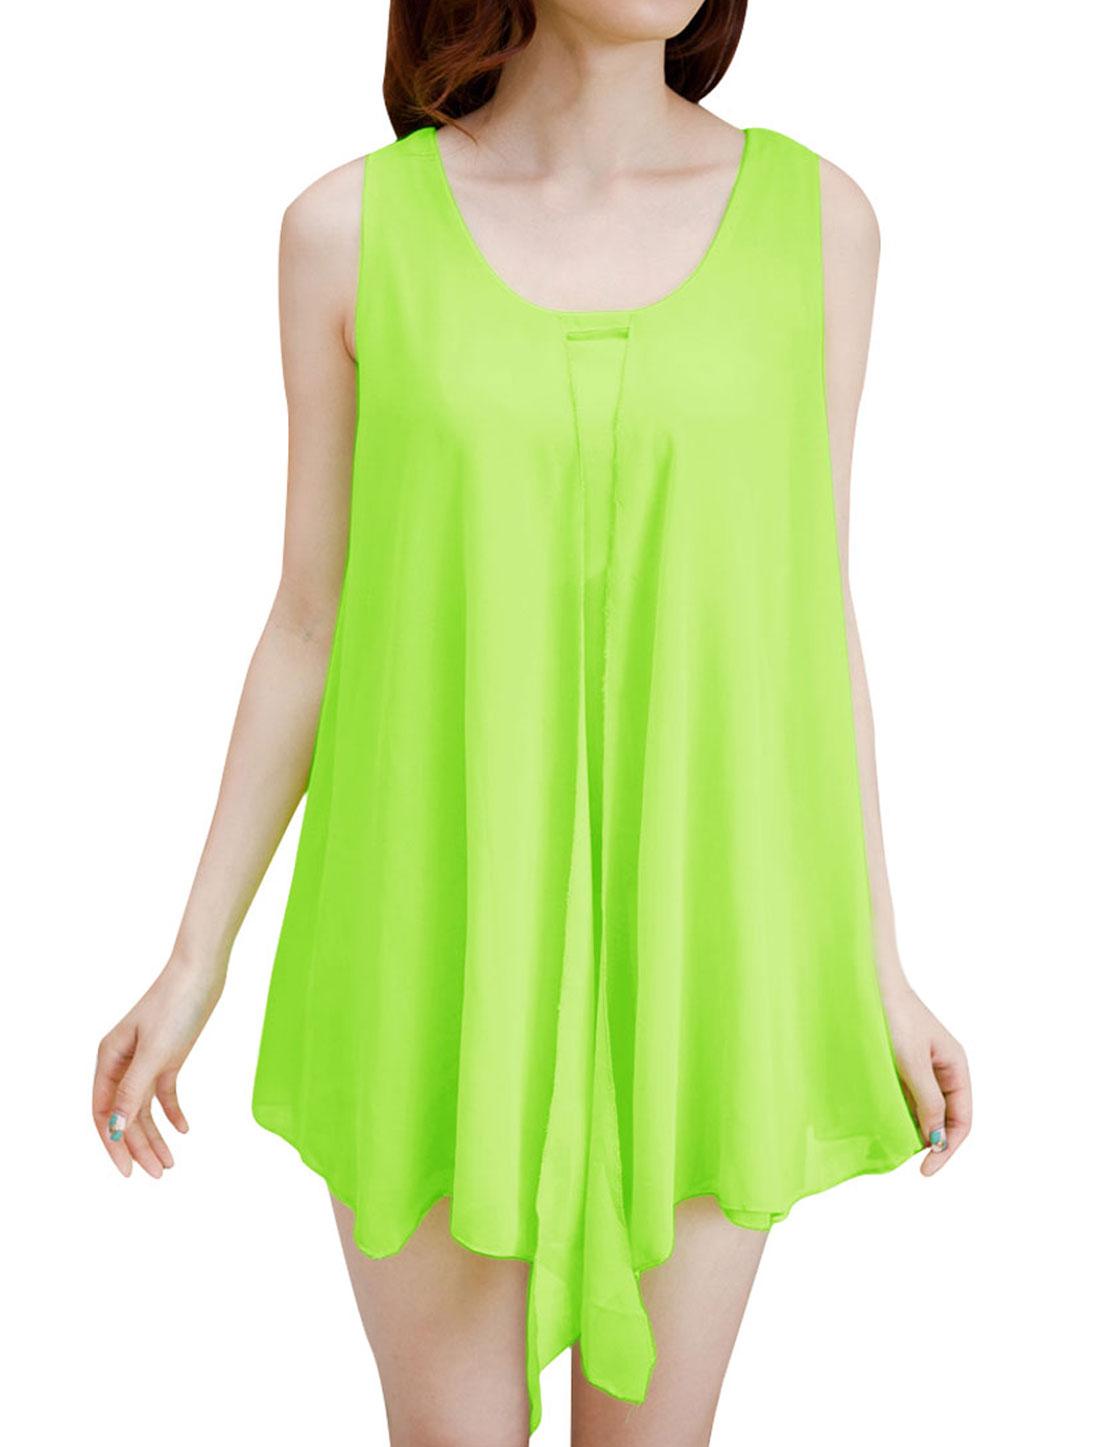 Lady Chiffon Elegant Sleeveless Modern Tops Blouses Lime S